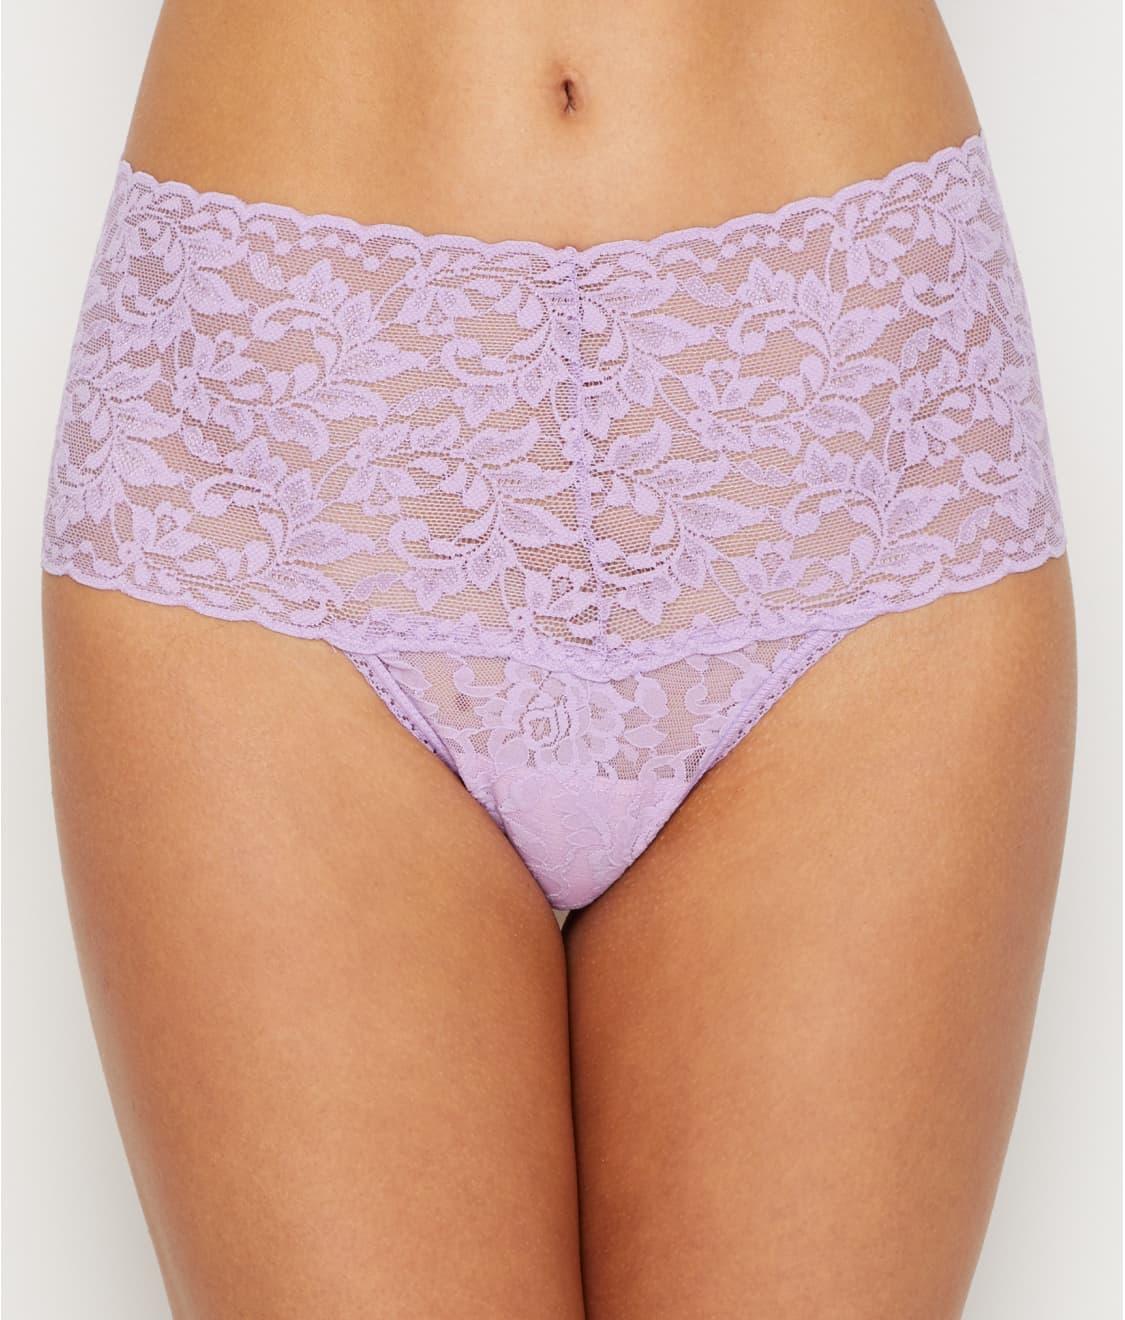 731ca405e See Signature Lace Retro Thong in Lavender Satchet